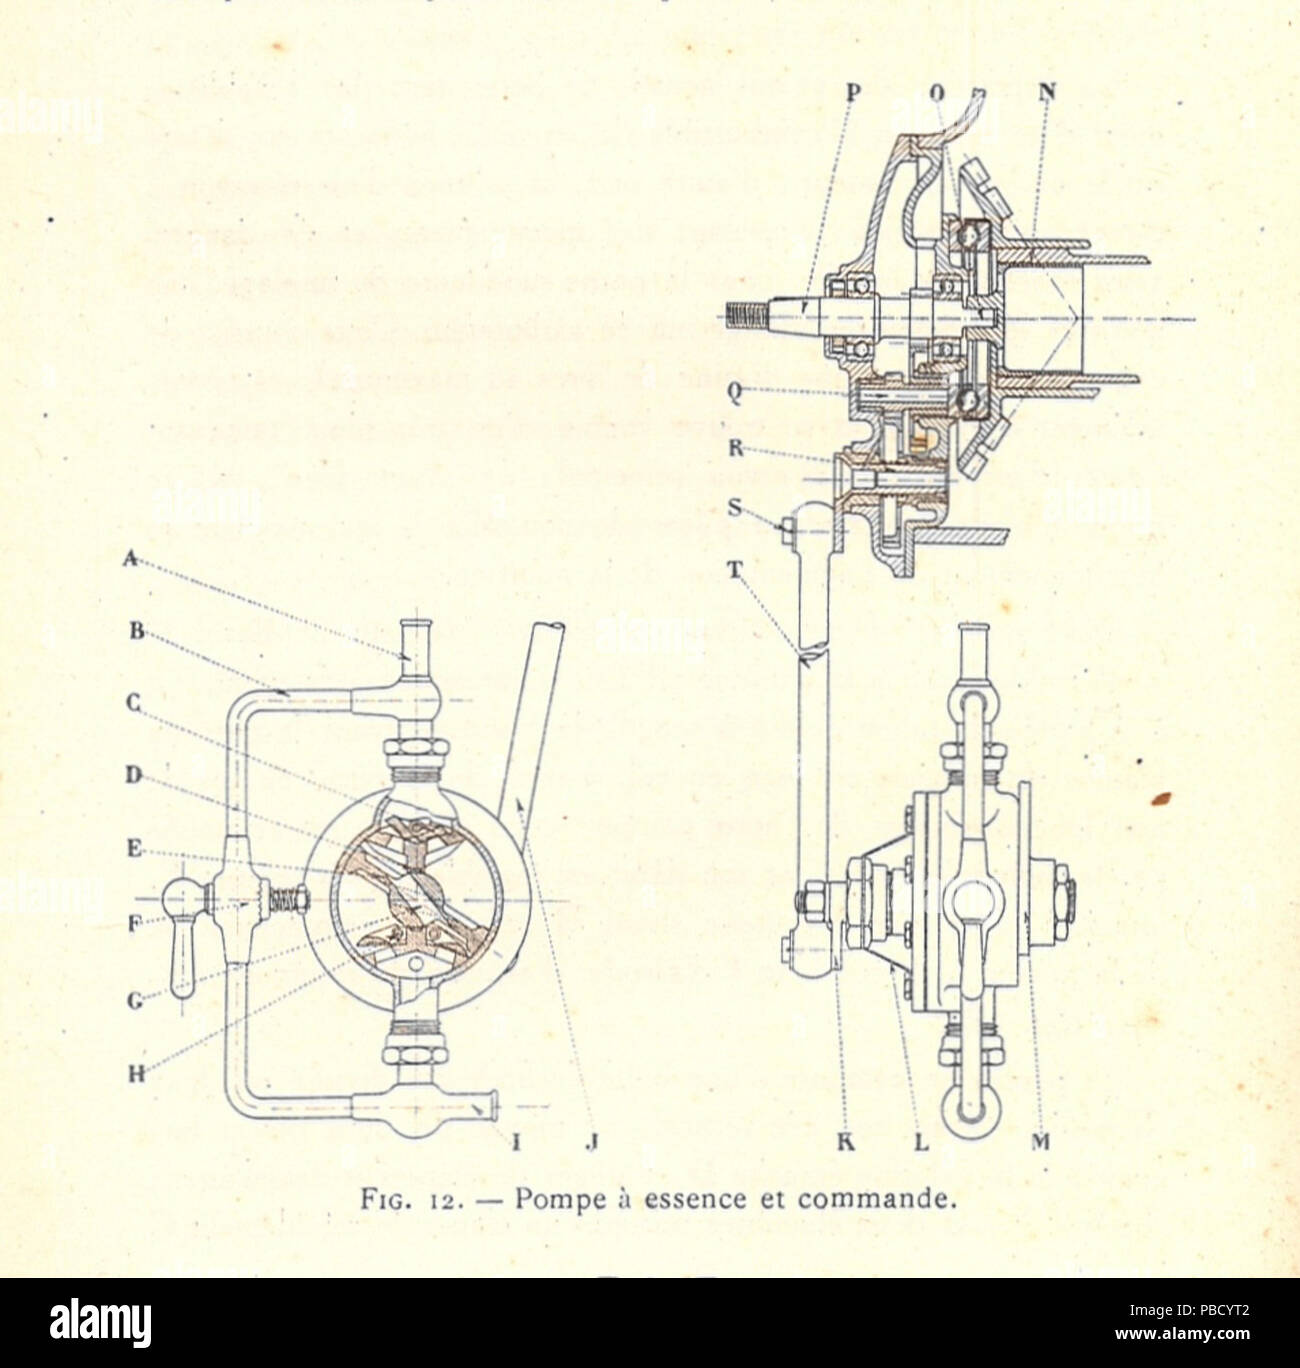 hight resolution of renault fuel pump diagram wiring diagram derenault fuel pump diagram official site wiring diagrams 3208 cat